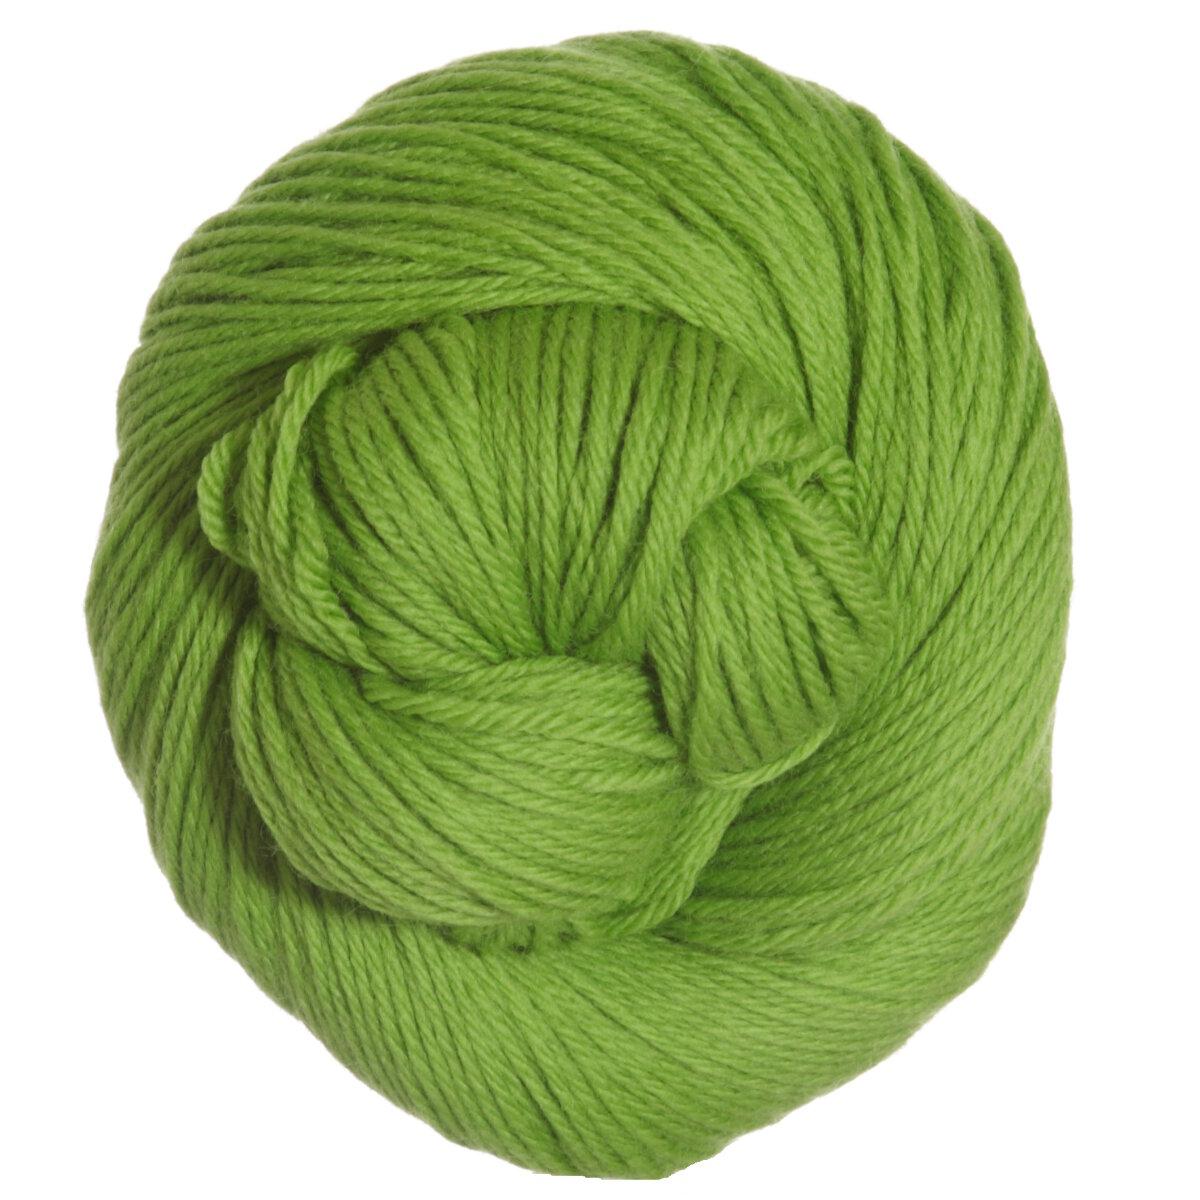 Cascade 220 Yarn - 8903 - Primavera at Jimmy Beans Wool